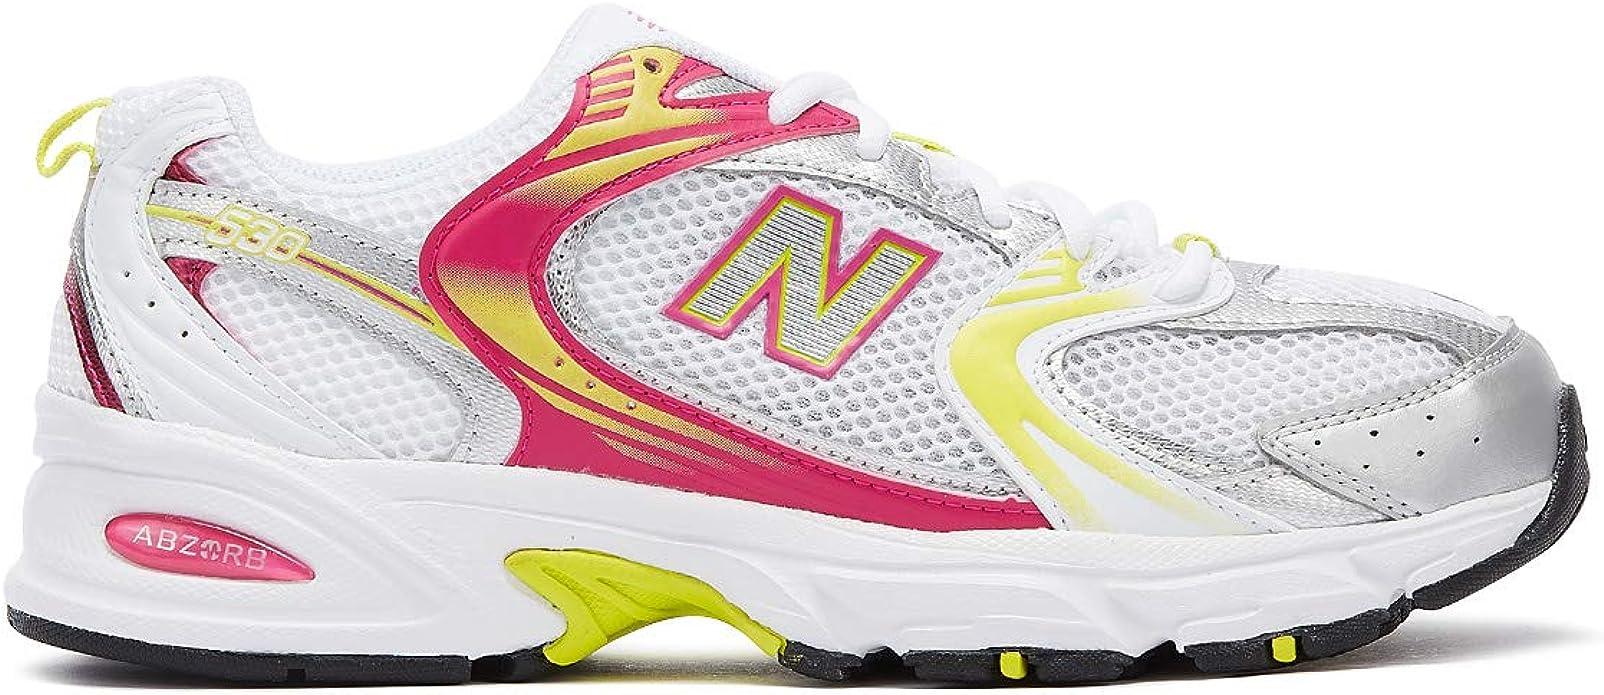 New Balance 530 Donna Bianco/Rosa/Giallo Sneaker-UK 5 / EU 37.5 ...